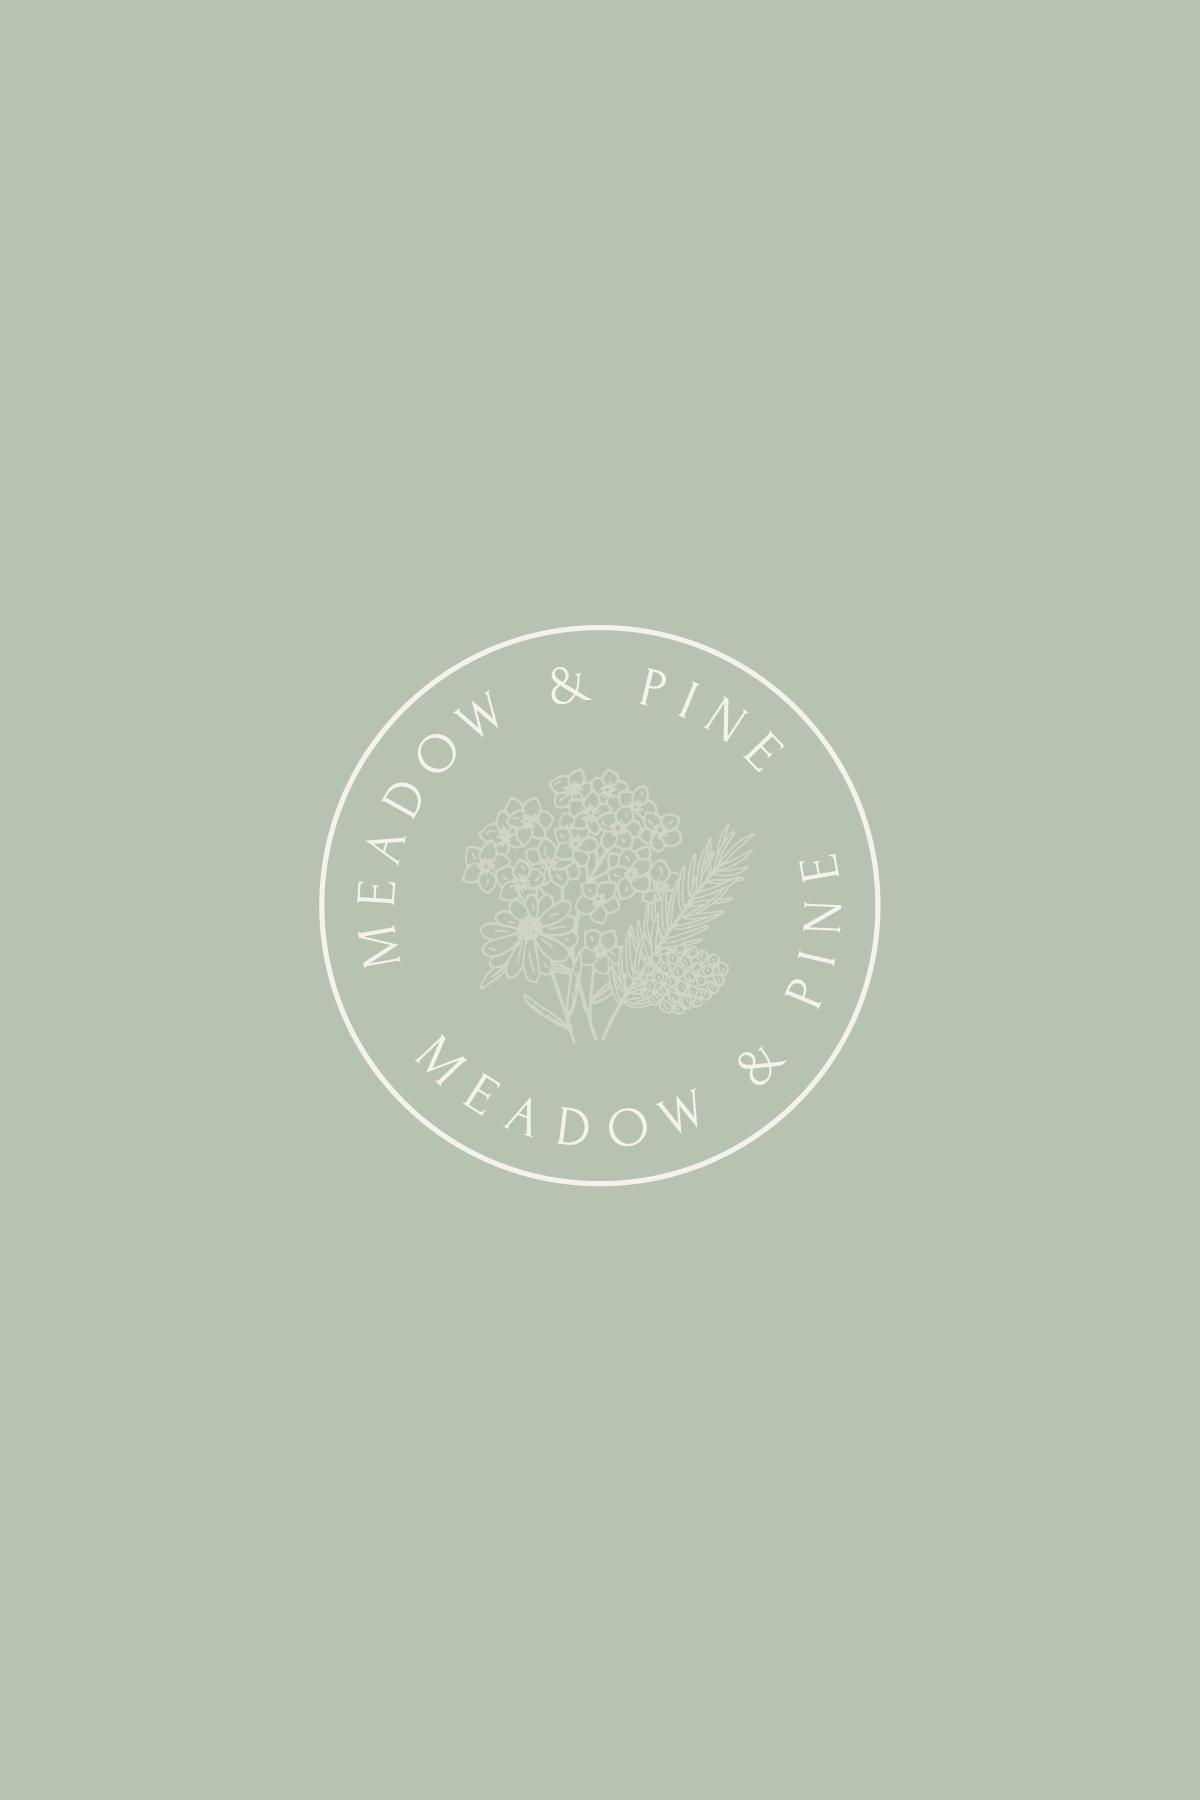 Meadow & Pine Photography — Bea & Bloom